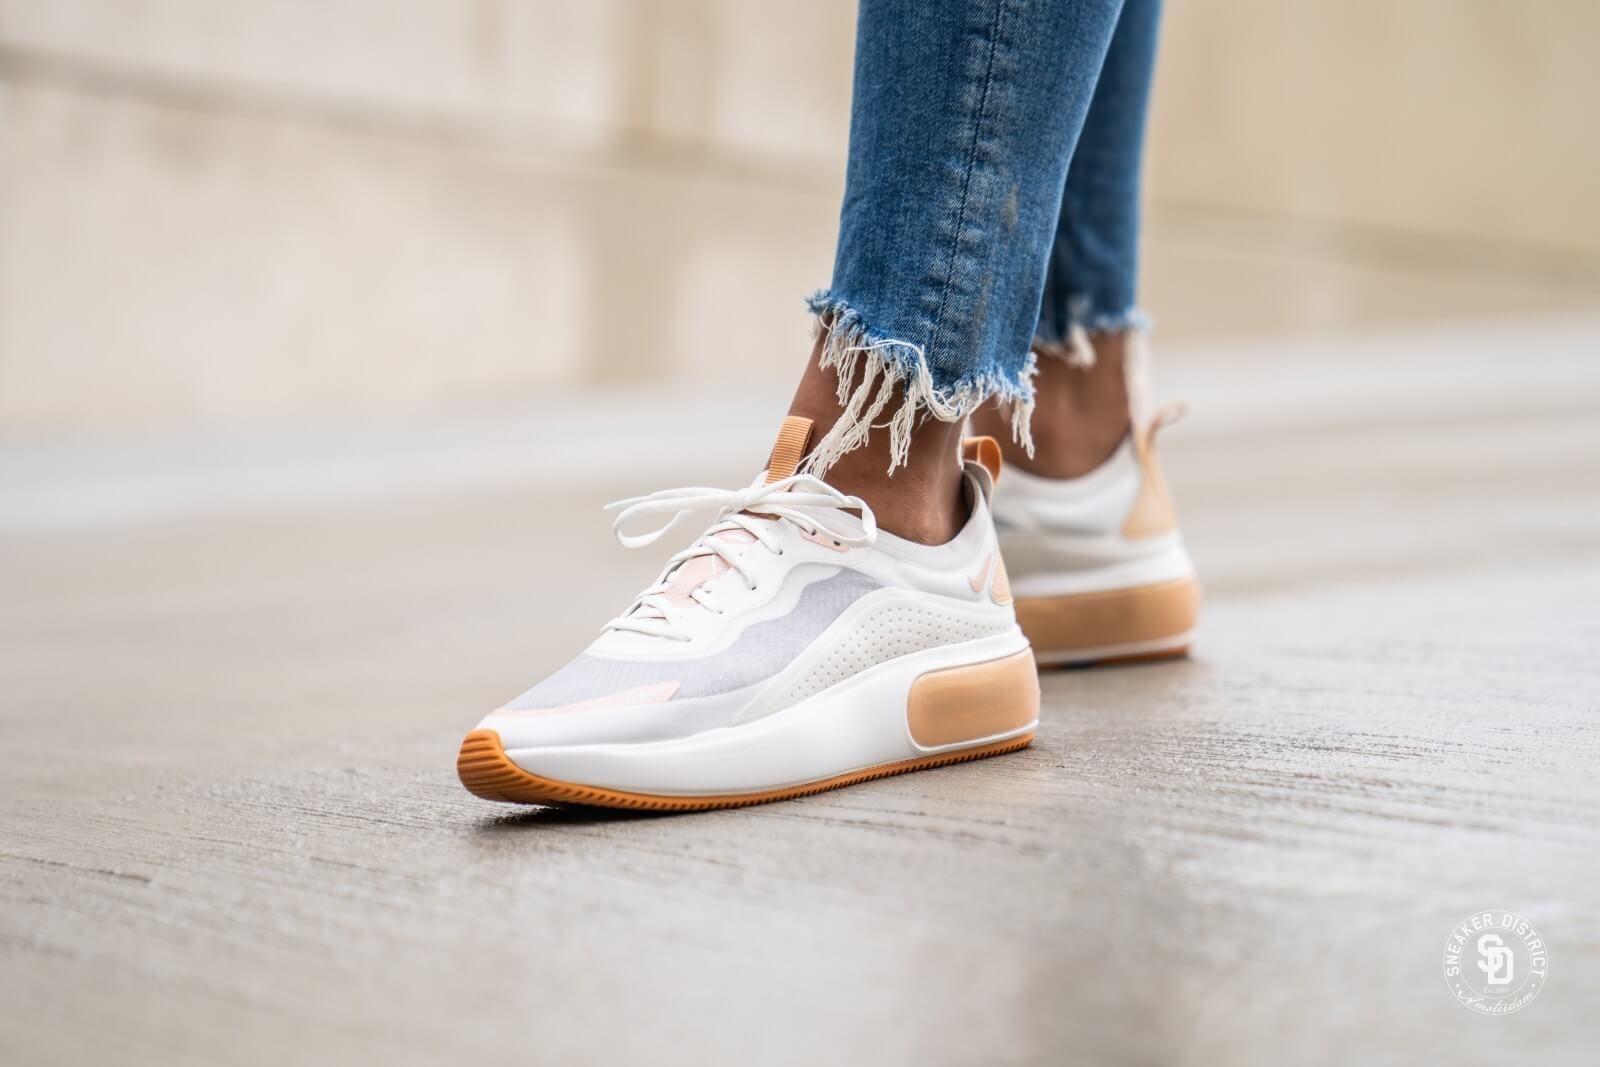 sneakers in 2020 | Air max women, Nike women, Nike